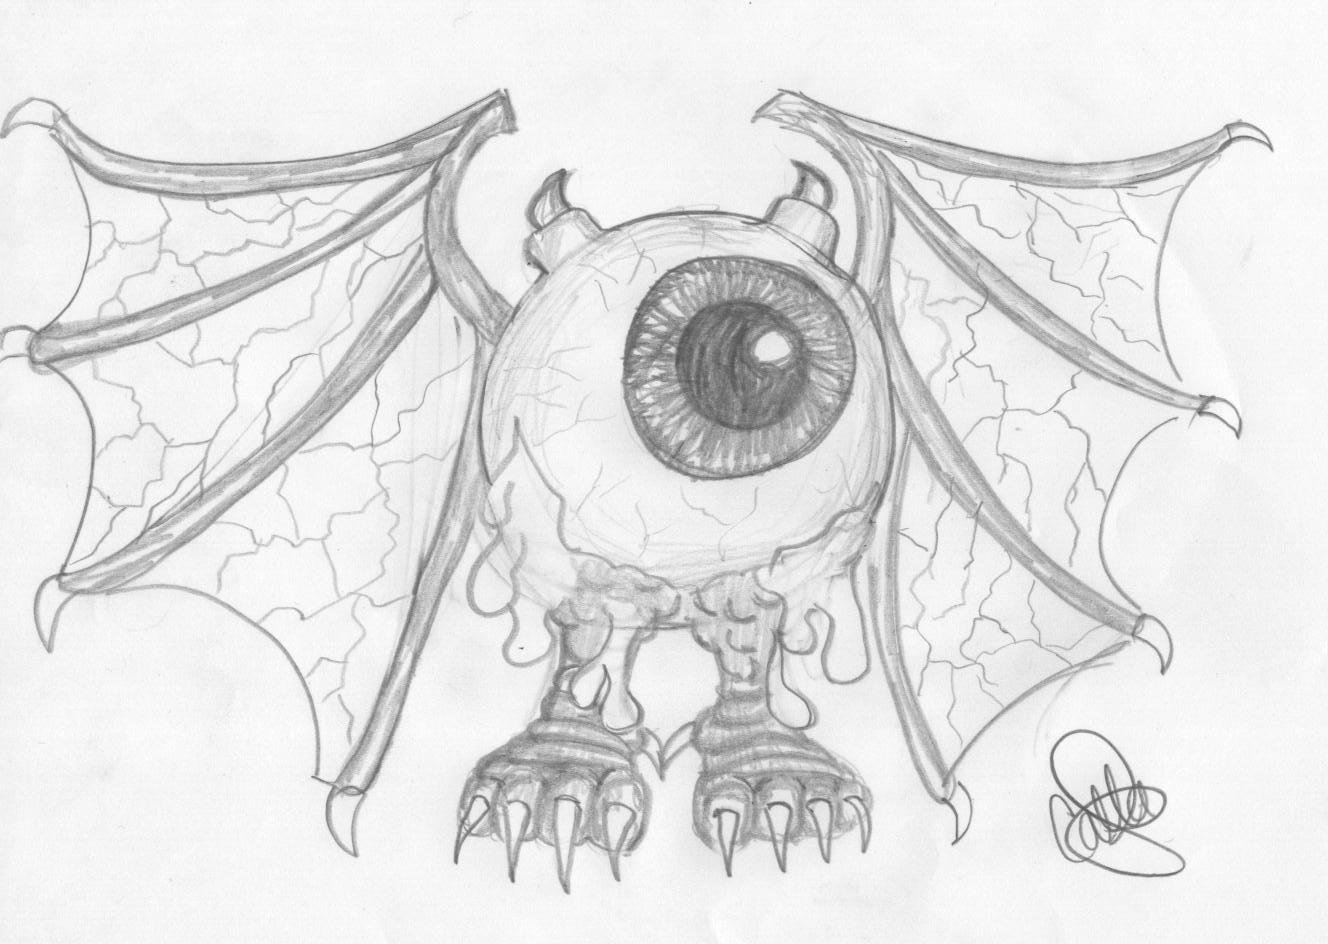 Drawn eyeball flying eyeball CrazyScorpio on by Eyeball Eyeball